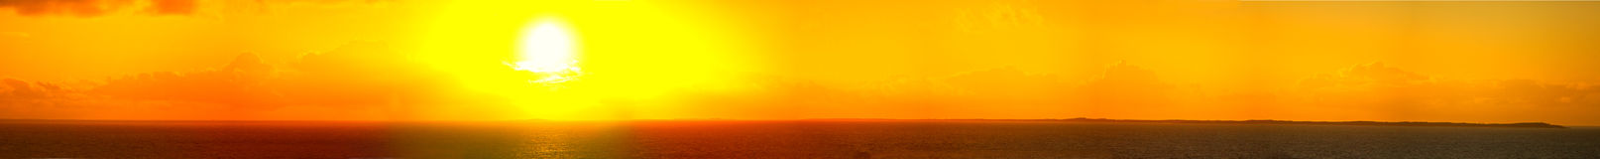 панорама 180 градусов Багам на восходе солнца Стоковое Изображение